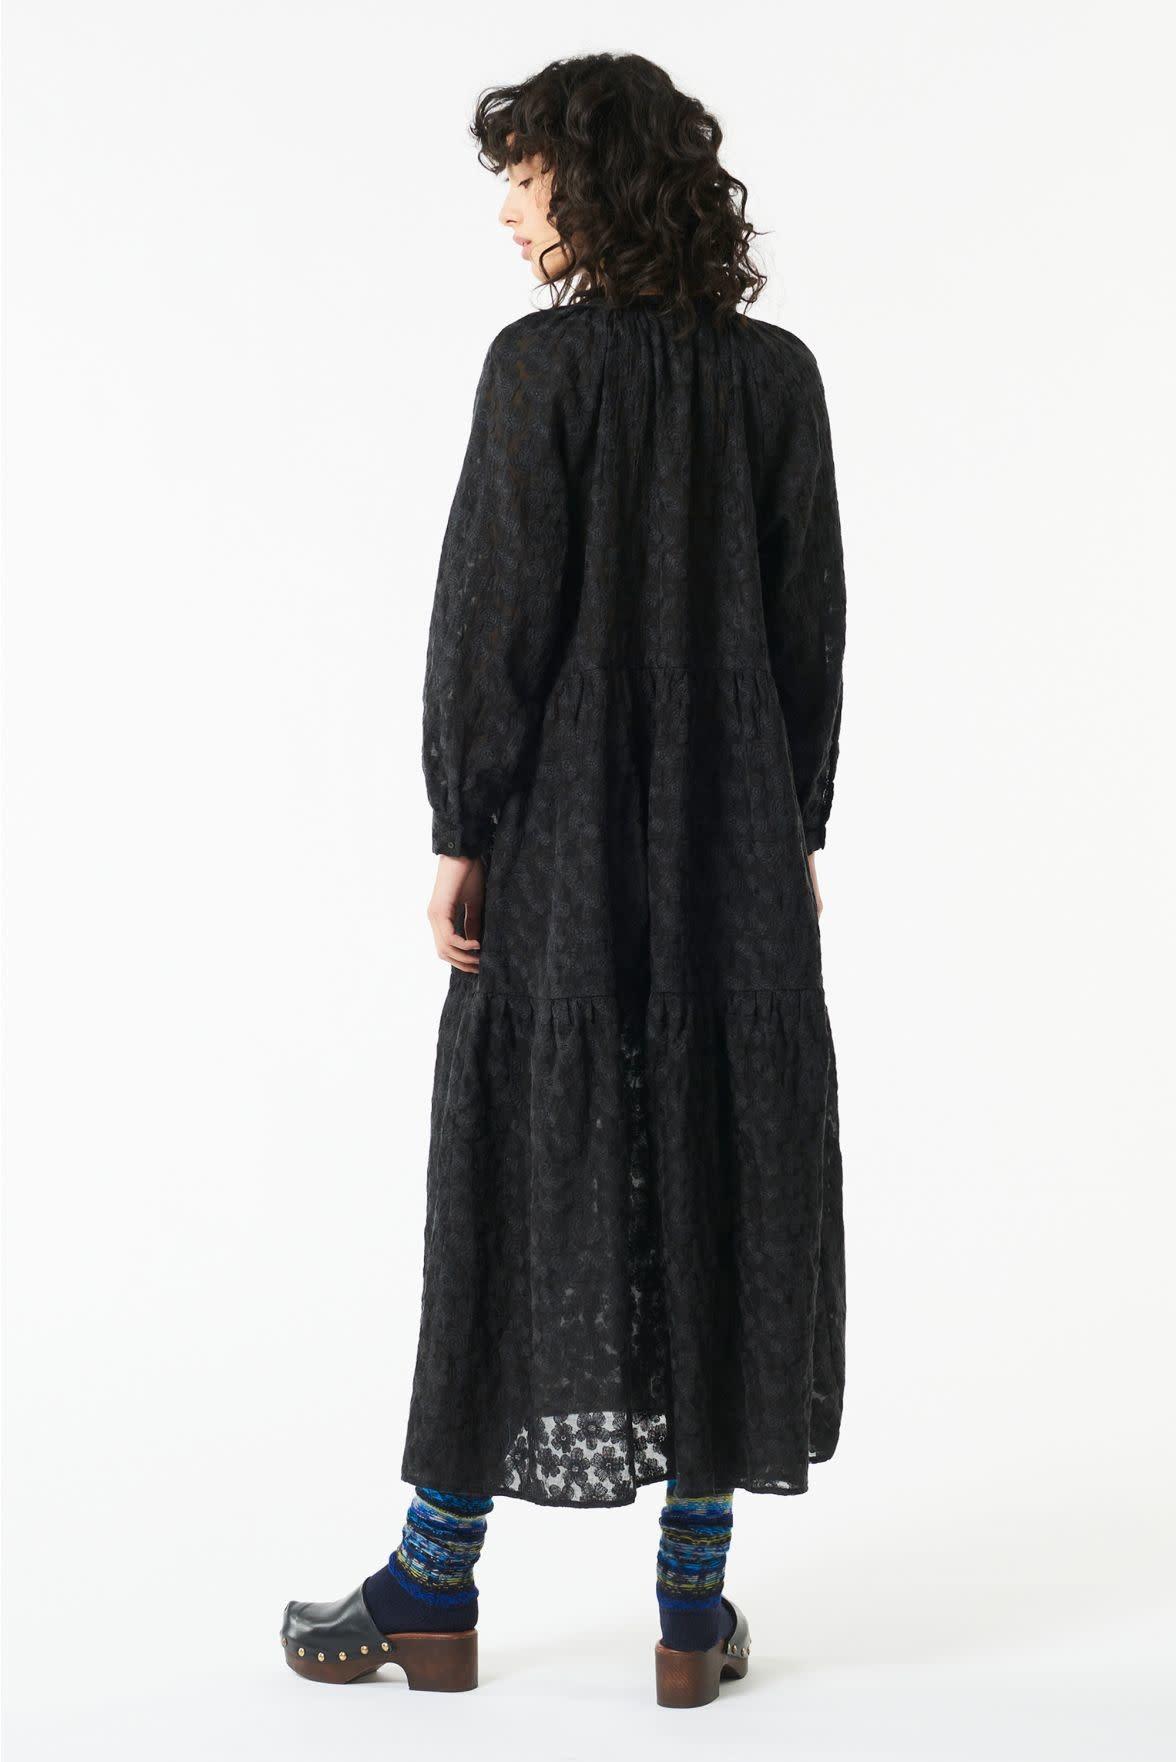 till black dress flower-2